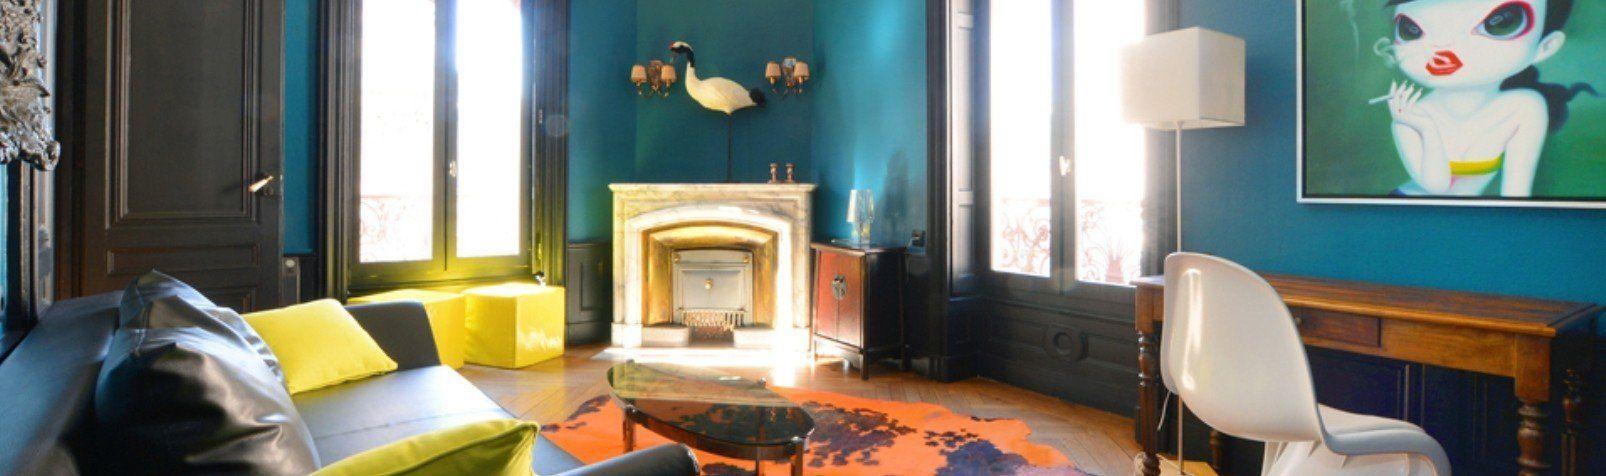 Lyon 1 – Terreaux Beaux Arts